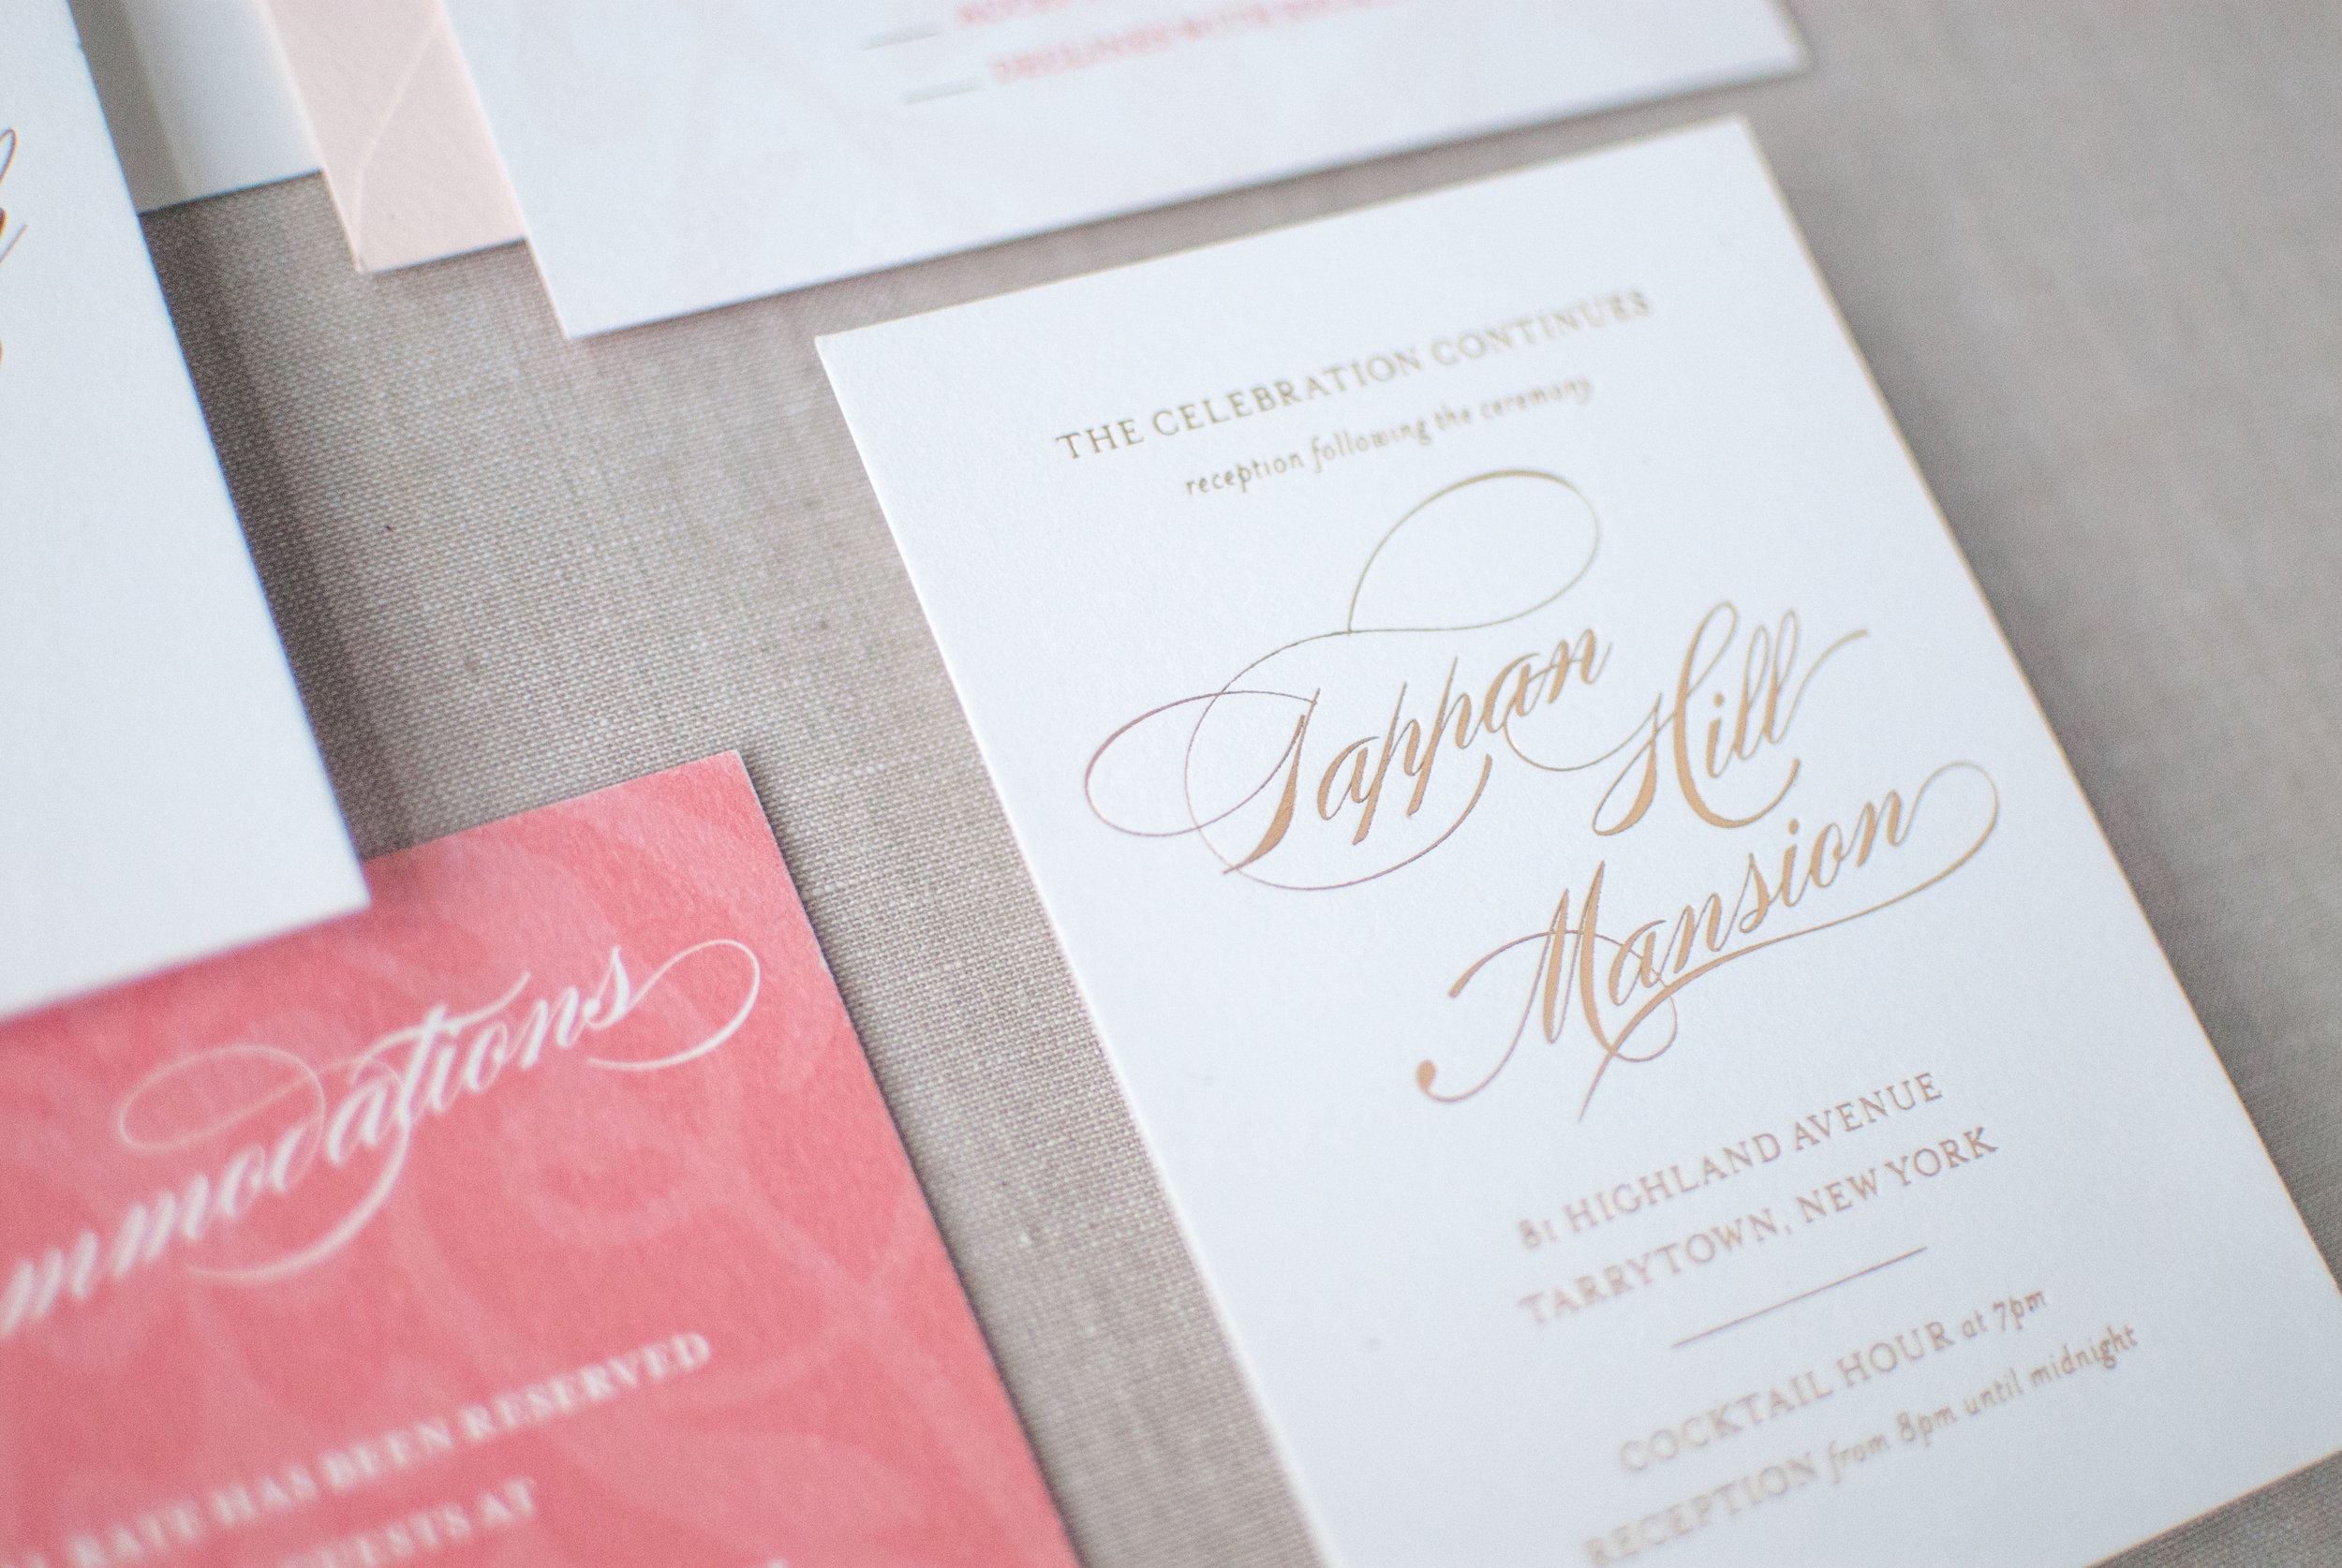 hj-wedding-invitations-daniela-anthony-10.jpg